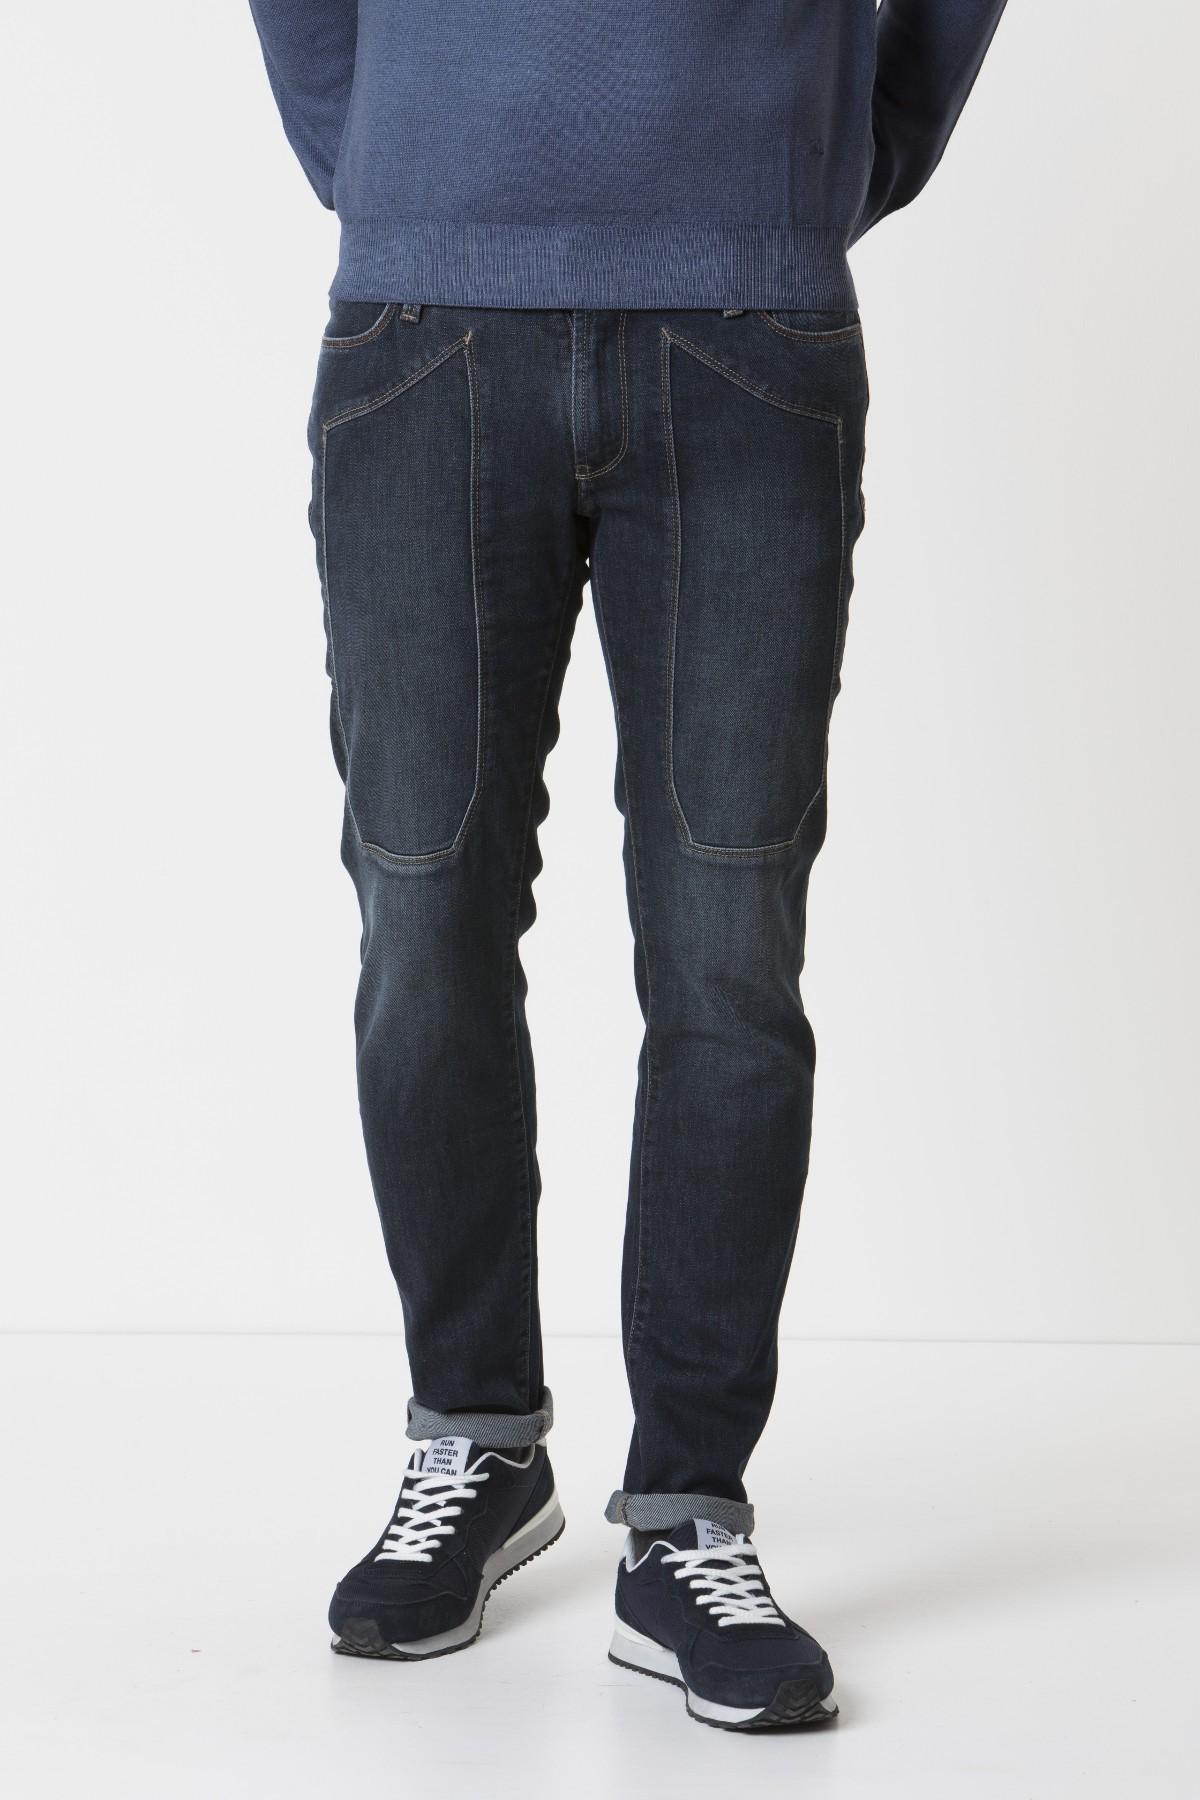 Jeans per uomo JECKERSON A I 17-18 - Rione Fontana 0ae7d18a0c4